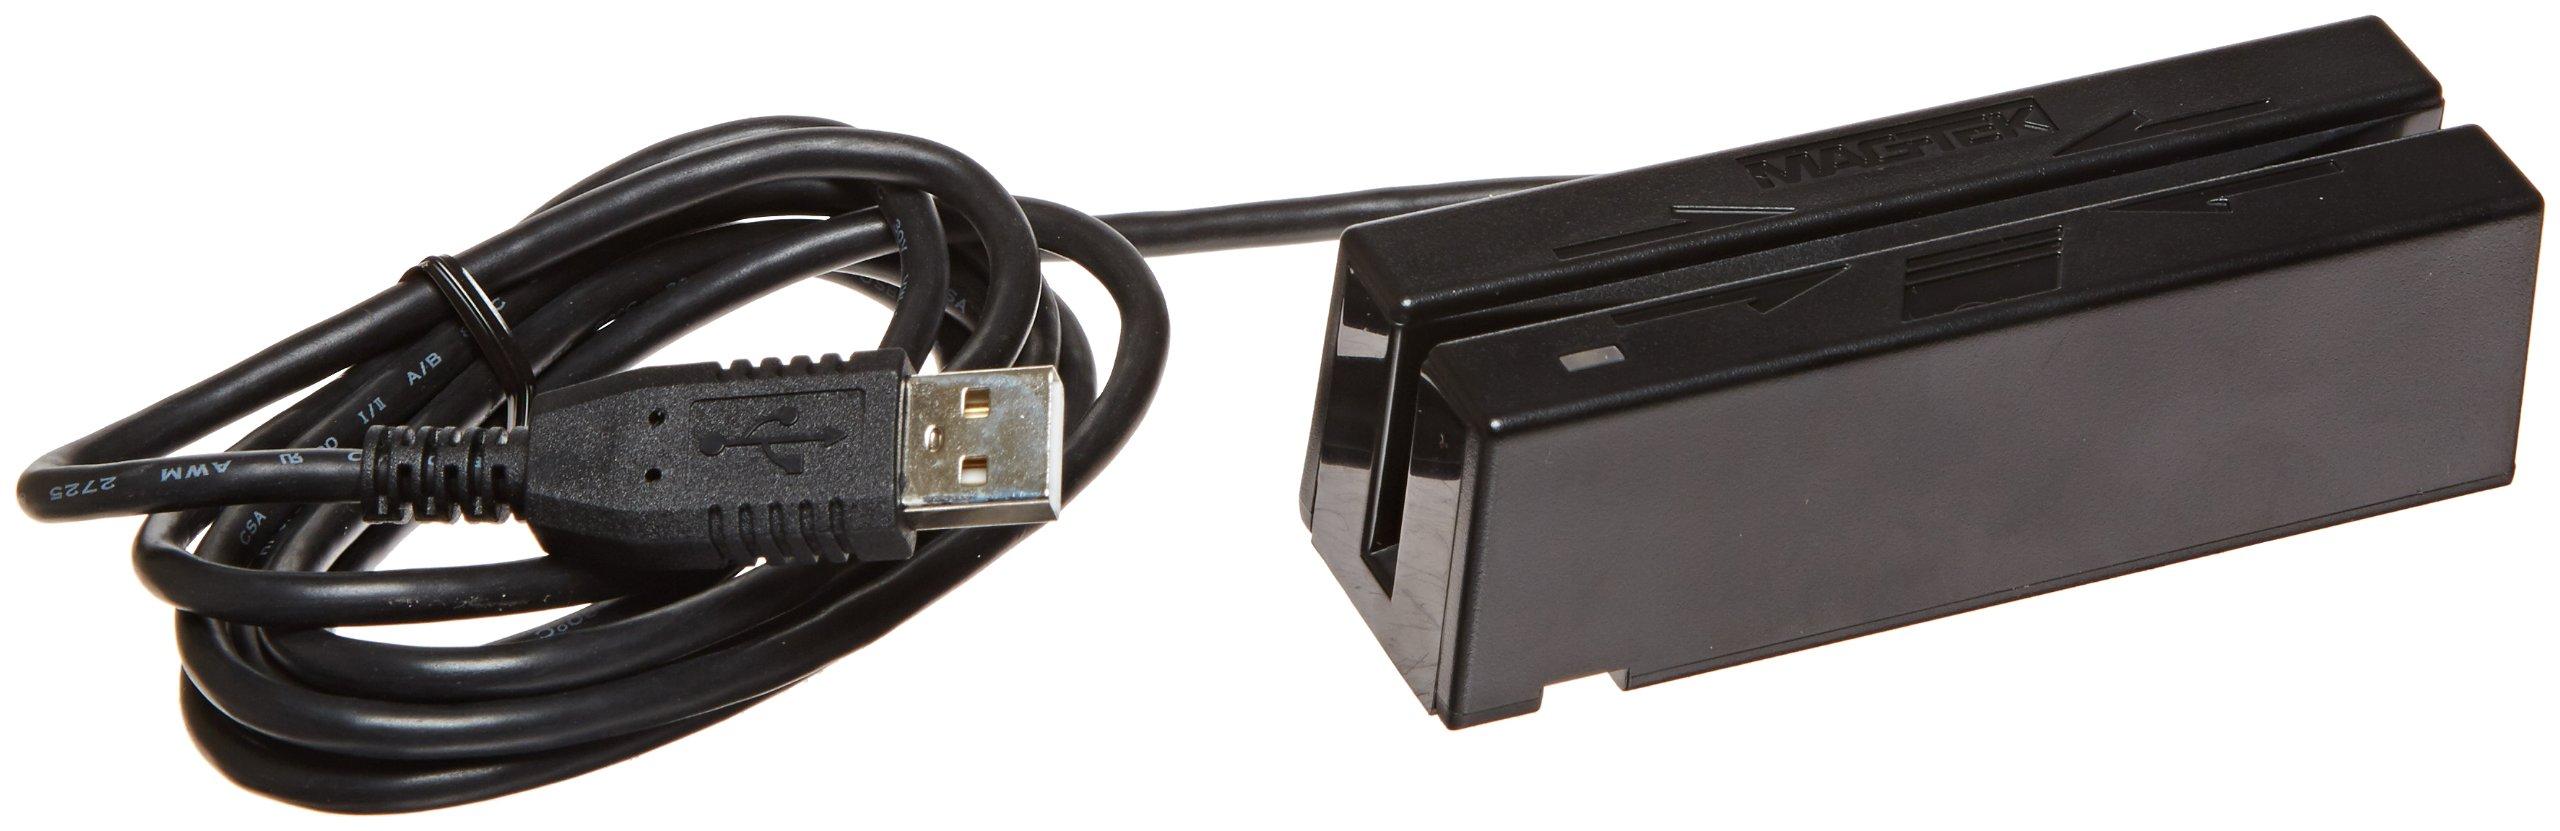 MagTek 21040145 SureSwipe Dual Head Triple Track Magnetic Stripe Card Reader with 6' USB Interface Cable, 60 in/s Swipe Speed, 5V, Black by MagTek